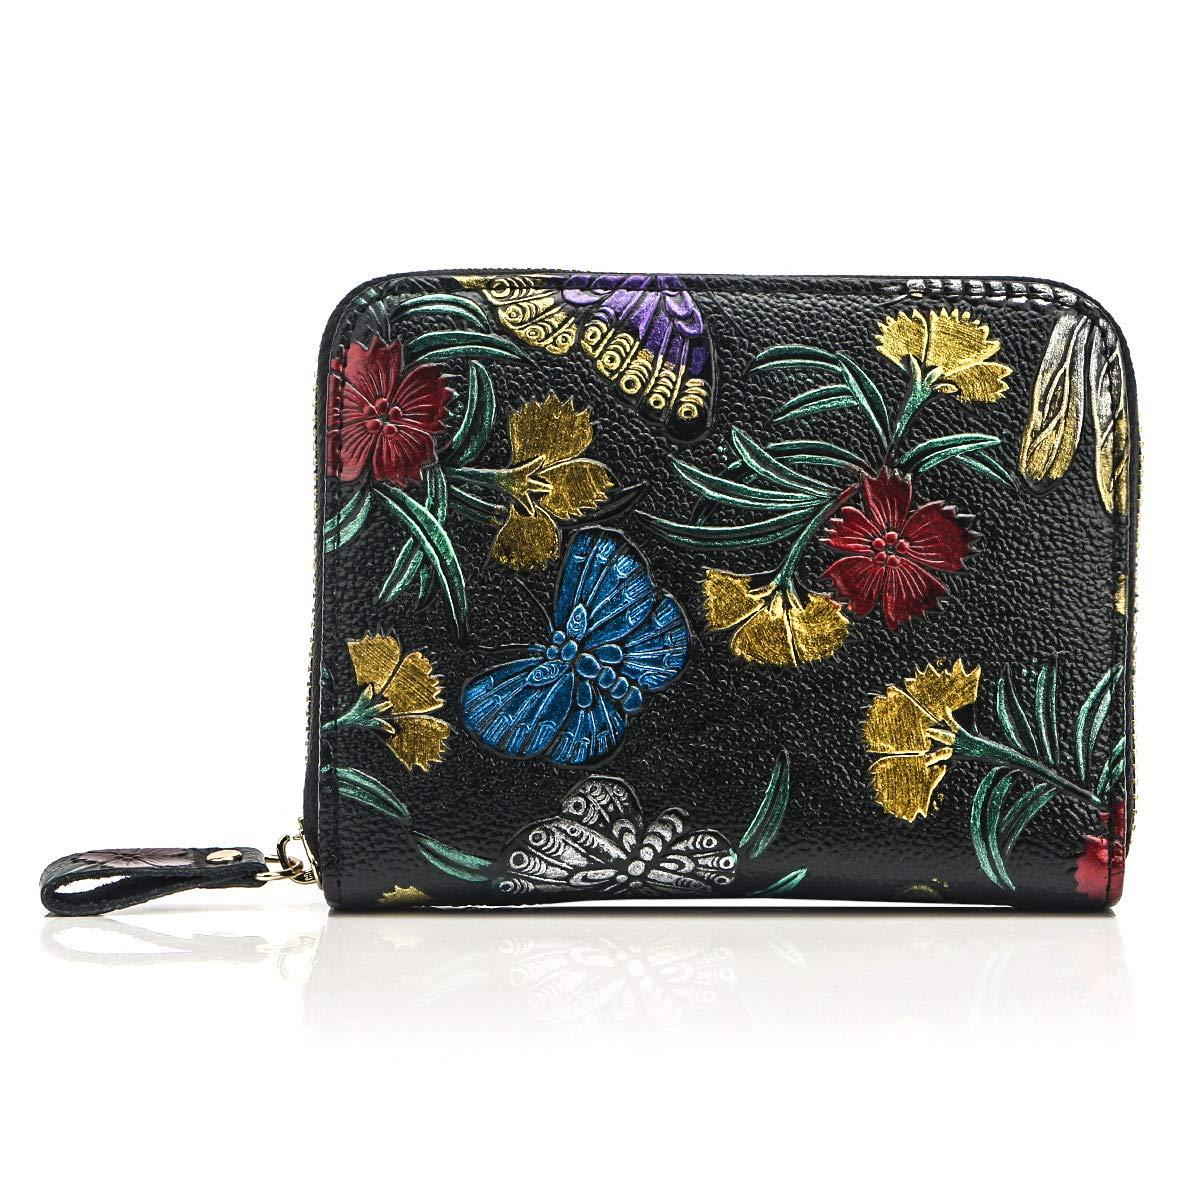 APHISON Women's RFID Blocking Card Case Cash Holder Leather Travel Wallet Black